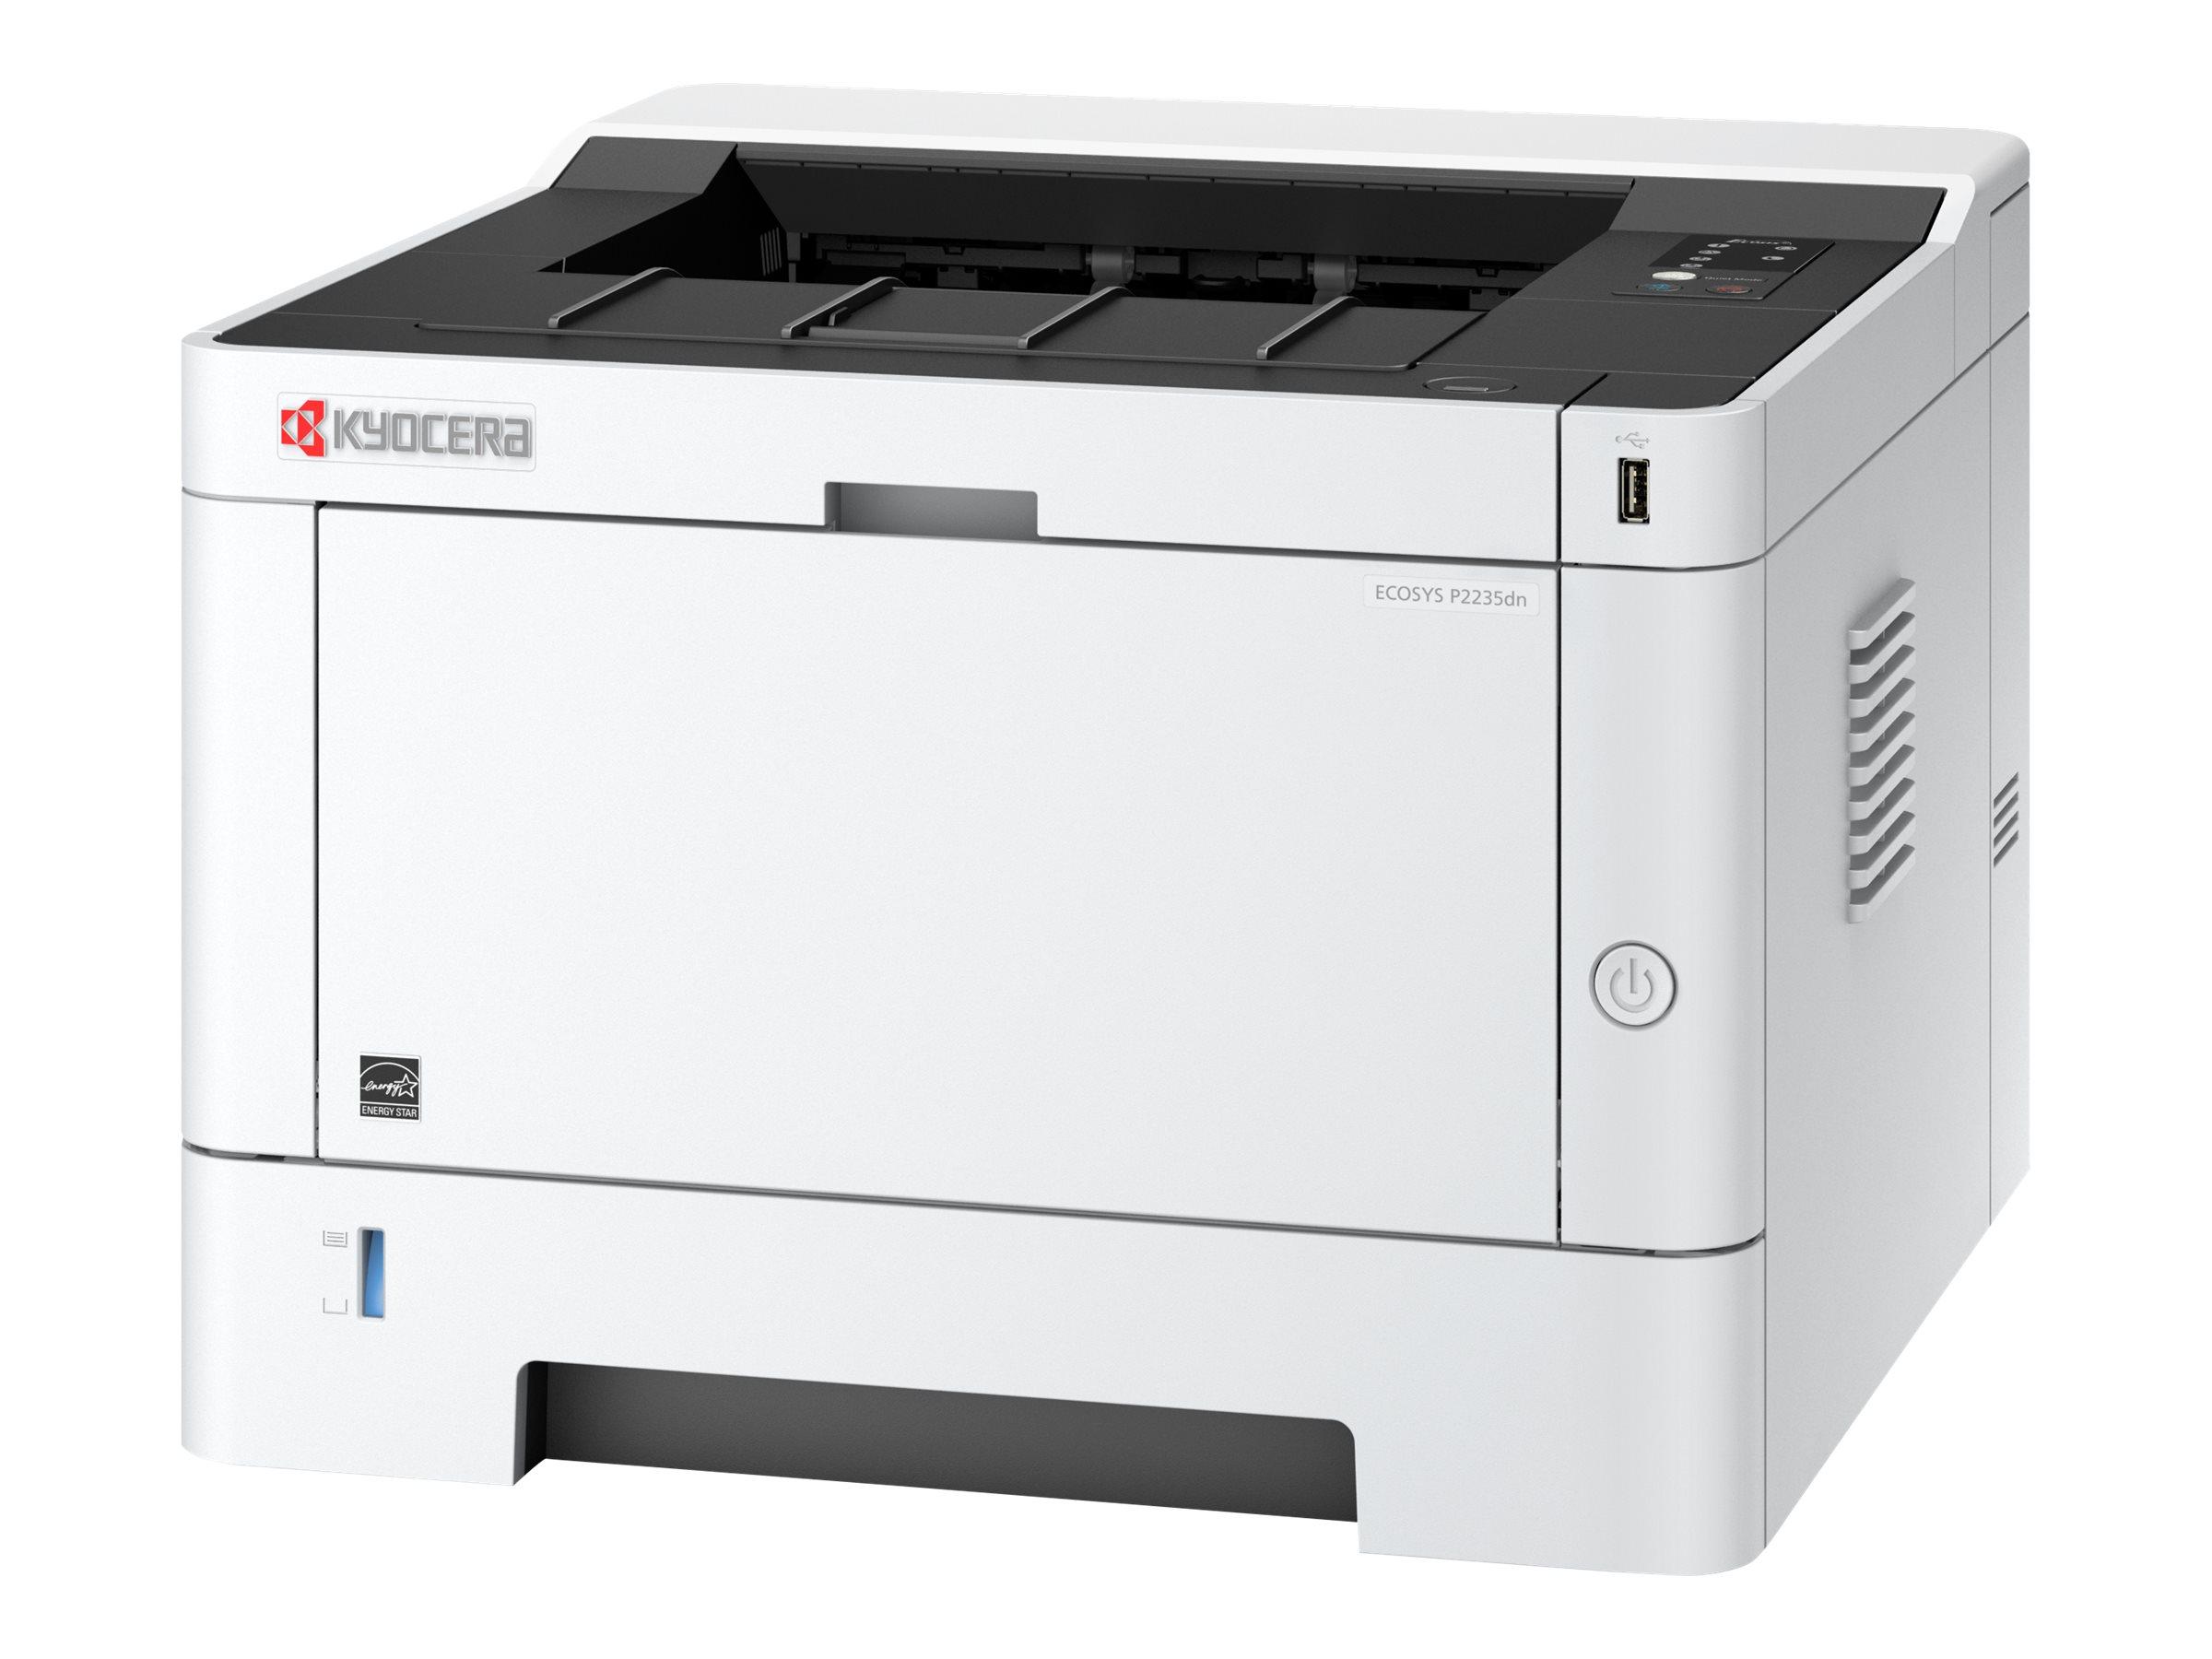 Kyocera ECOSYS P2235dn - Drucker - monochrom